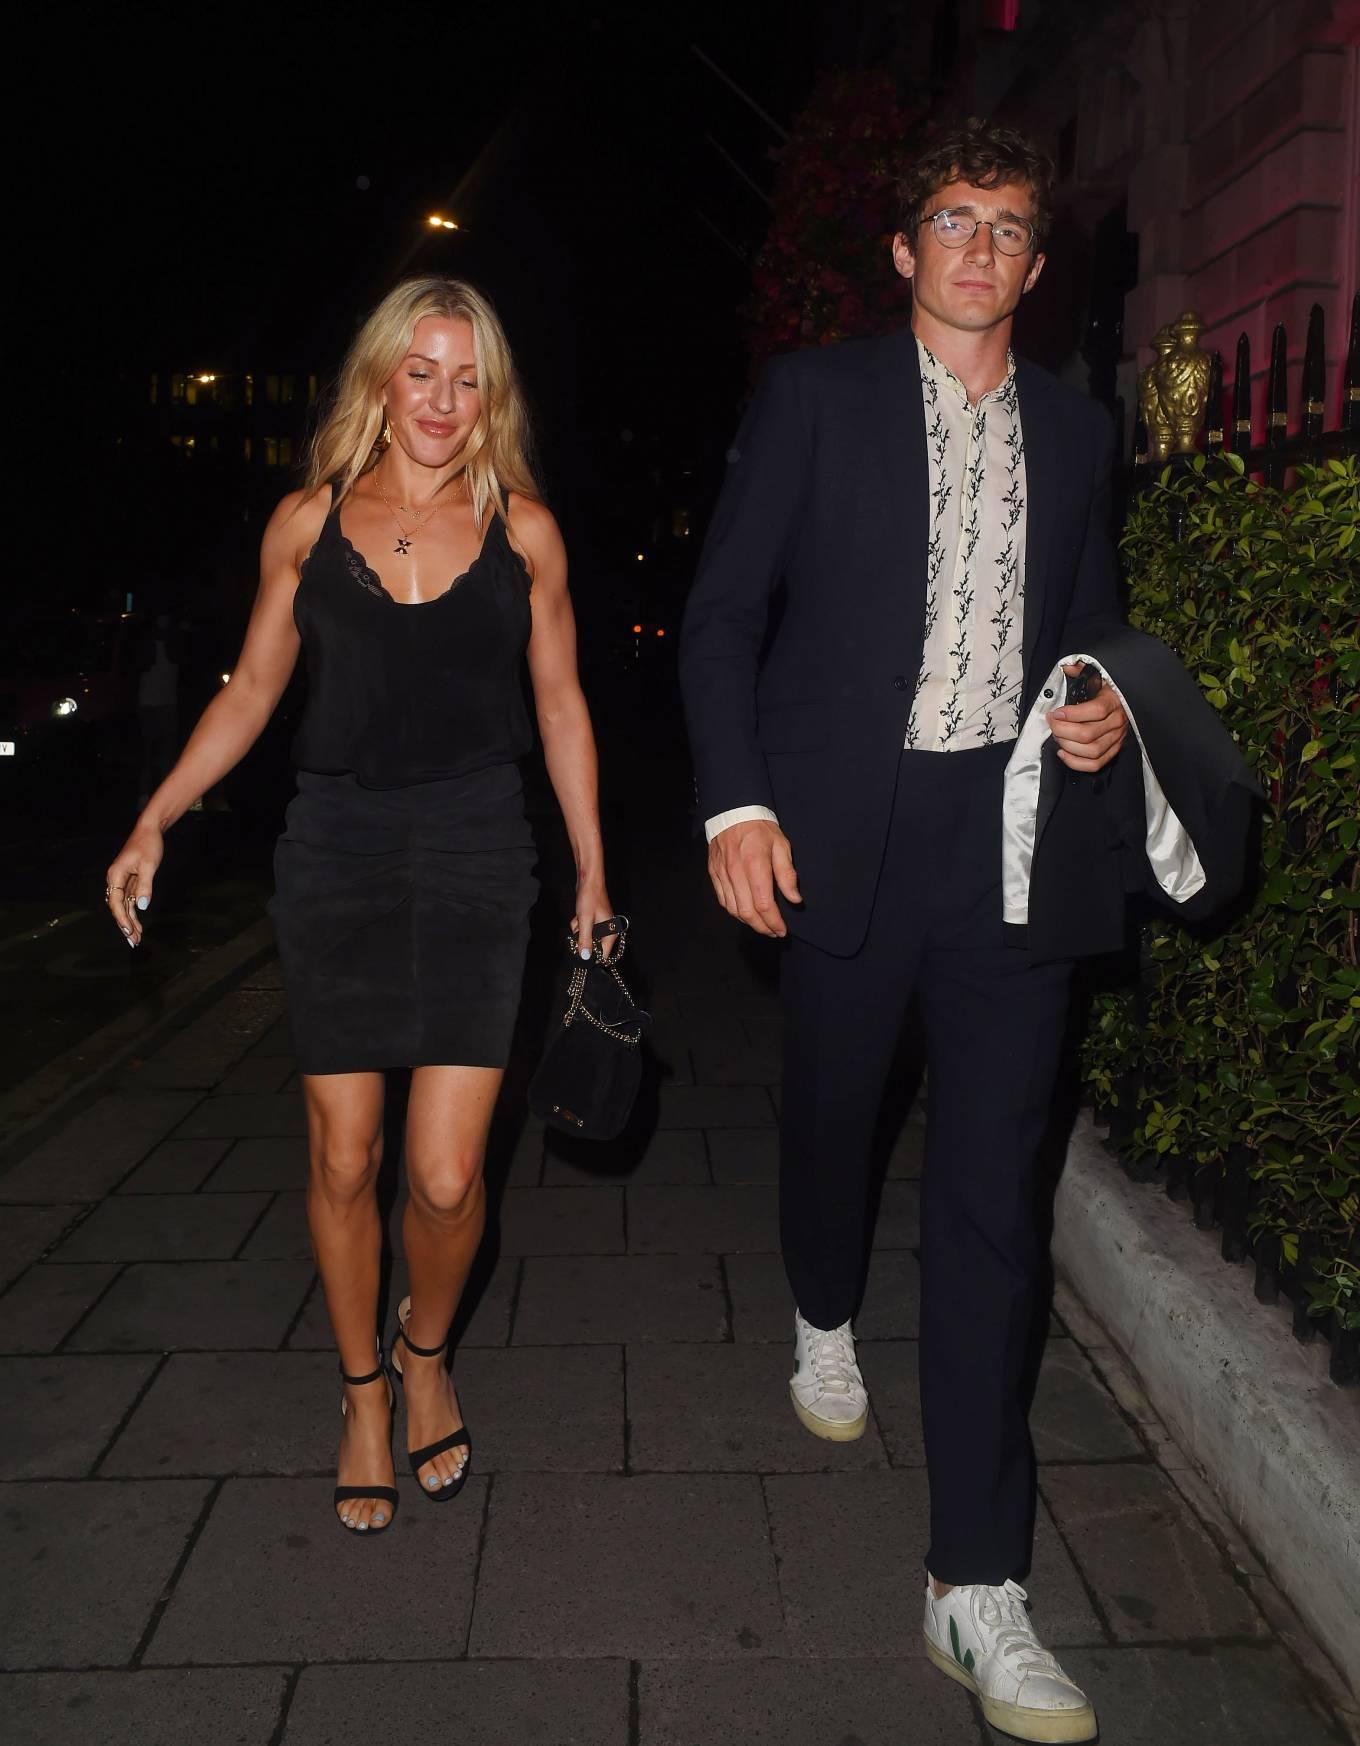 Ellie Goulding - Nightout outside Annabel's in London - 1 ...